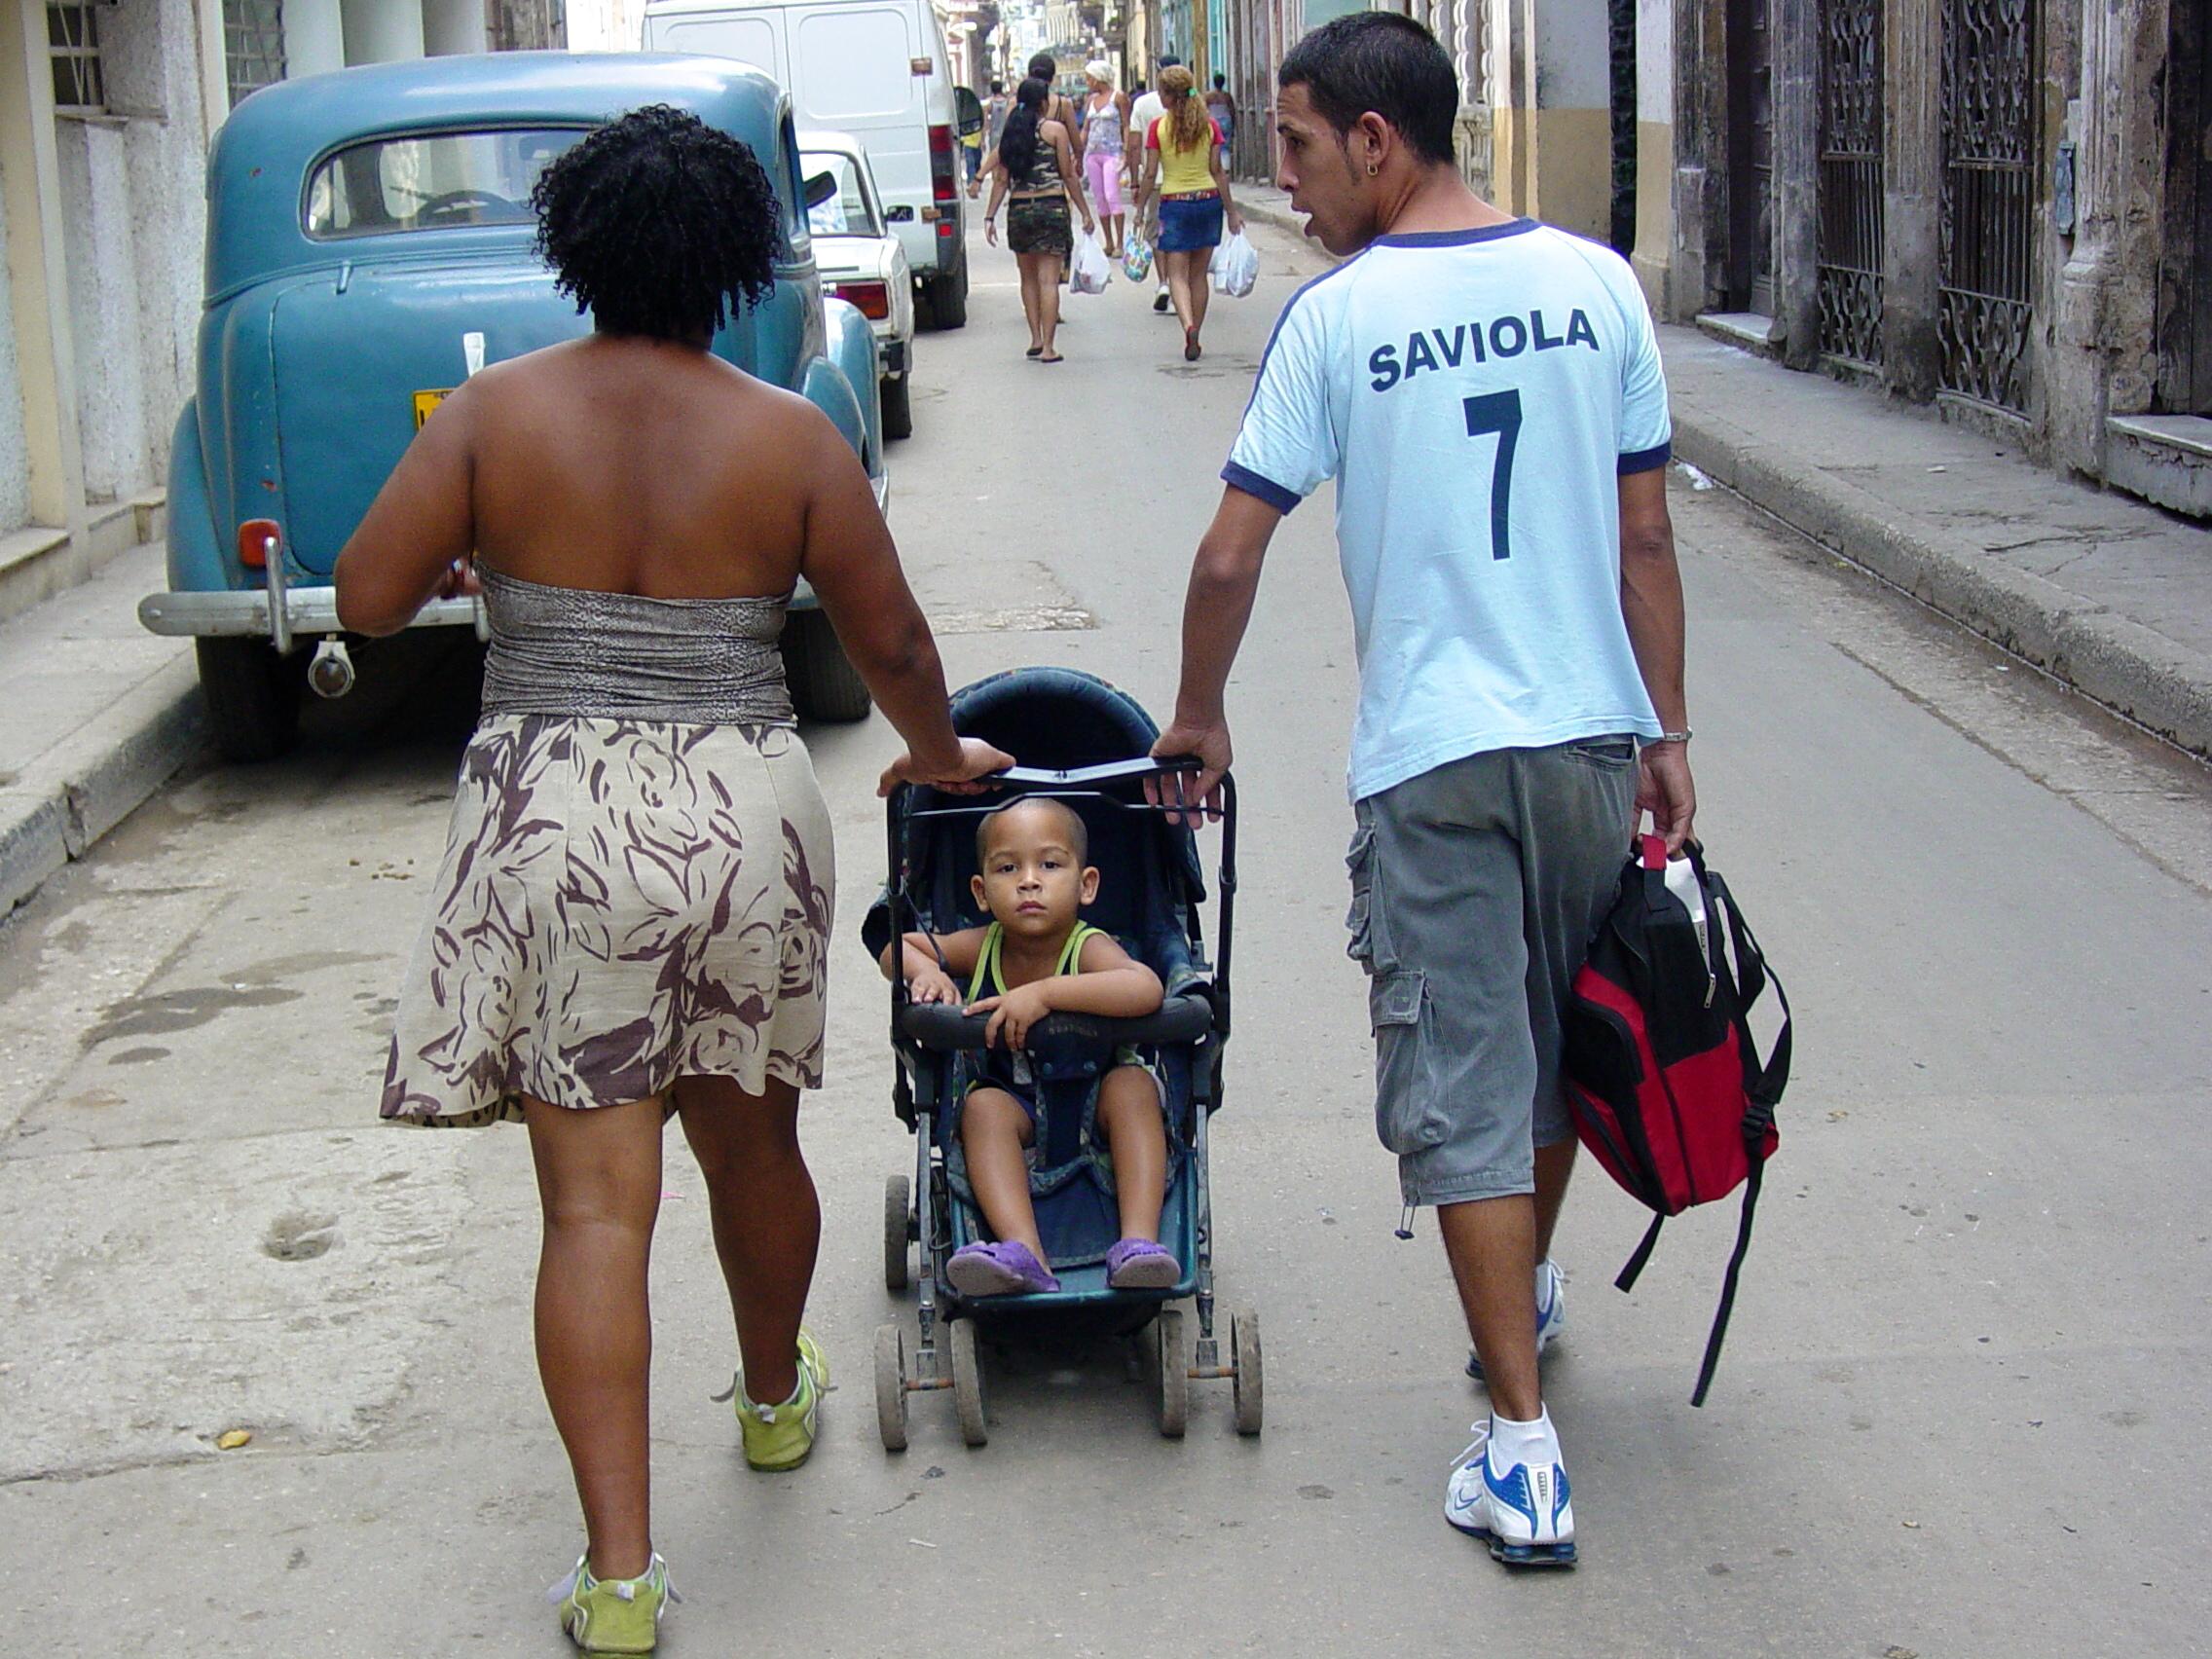 Couple_on_the_Street_with_Child_-_Centro_Habana_-_Havana_-_Cuba.JPG